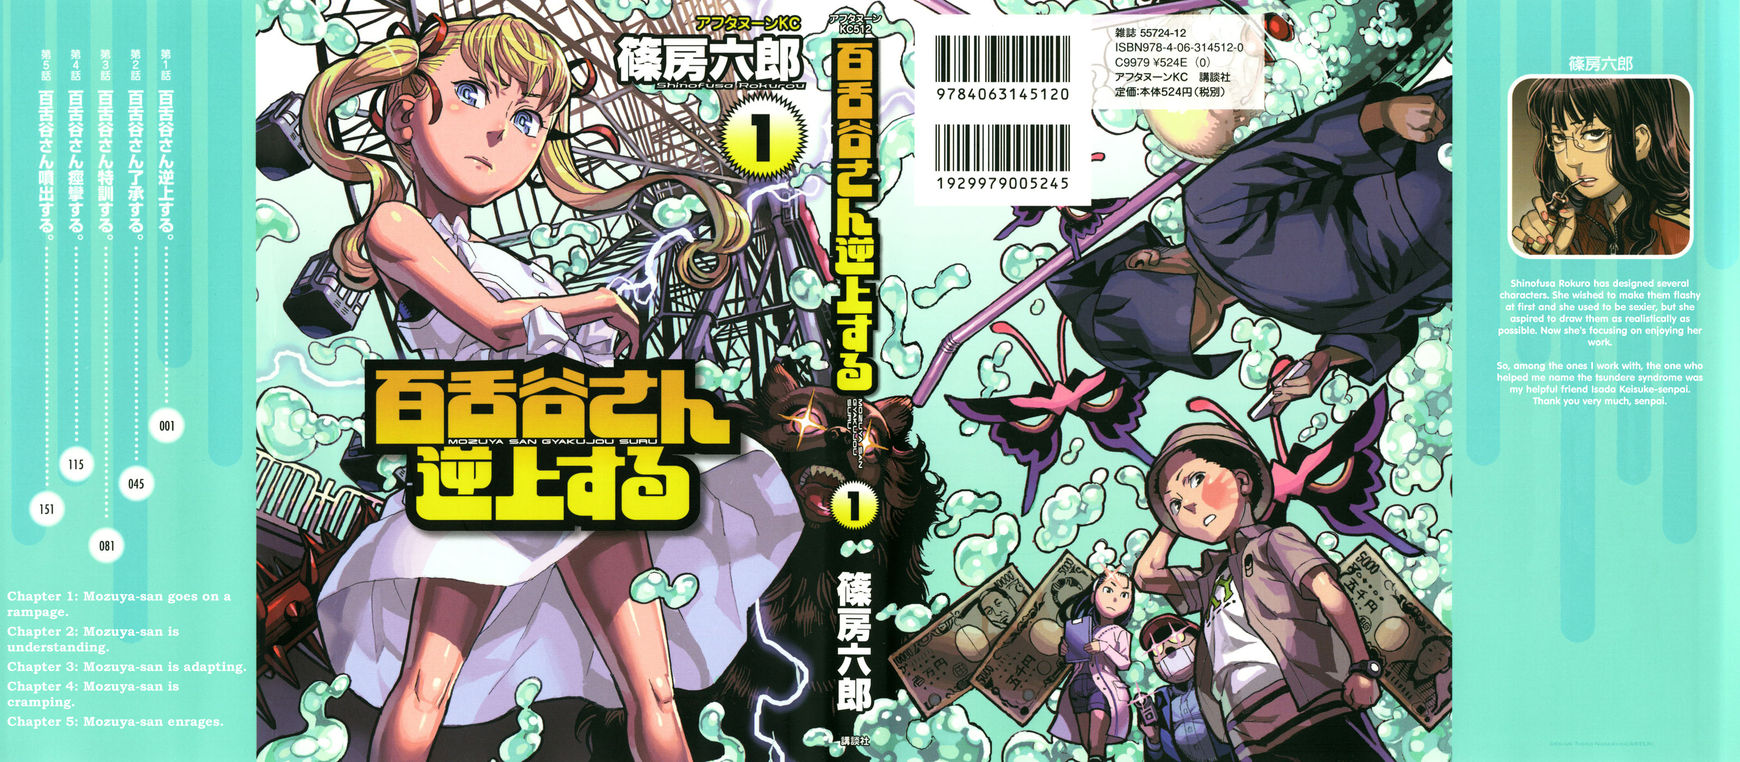 Mozuya-san Gyakujousuru 1 Page 1